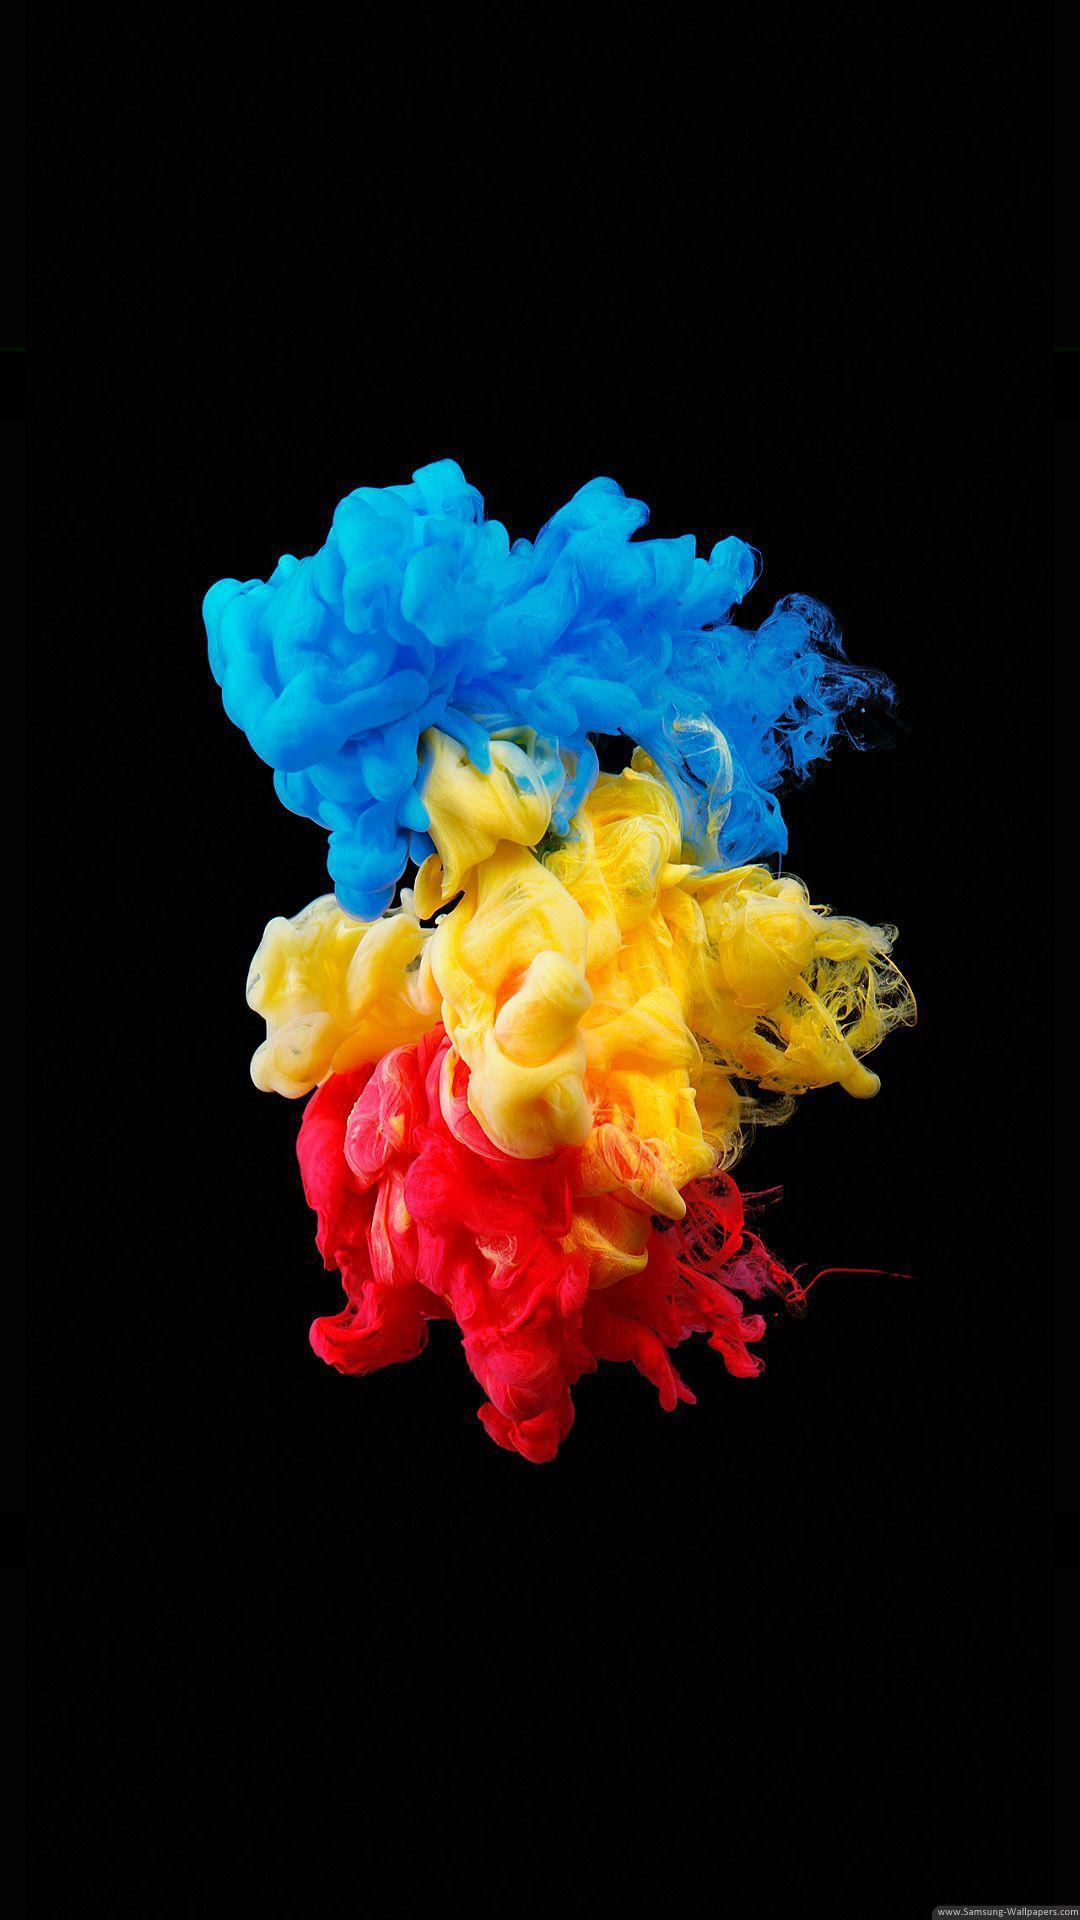 Color Smoke Wallpapers Wallpaper Cave